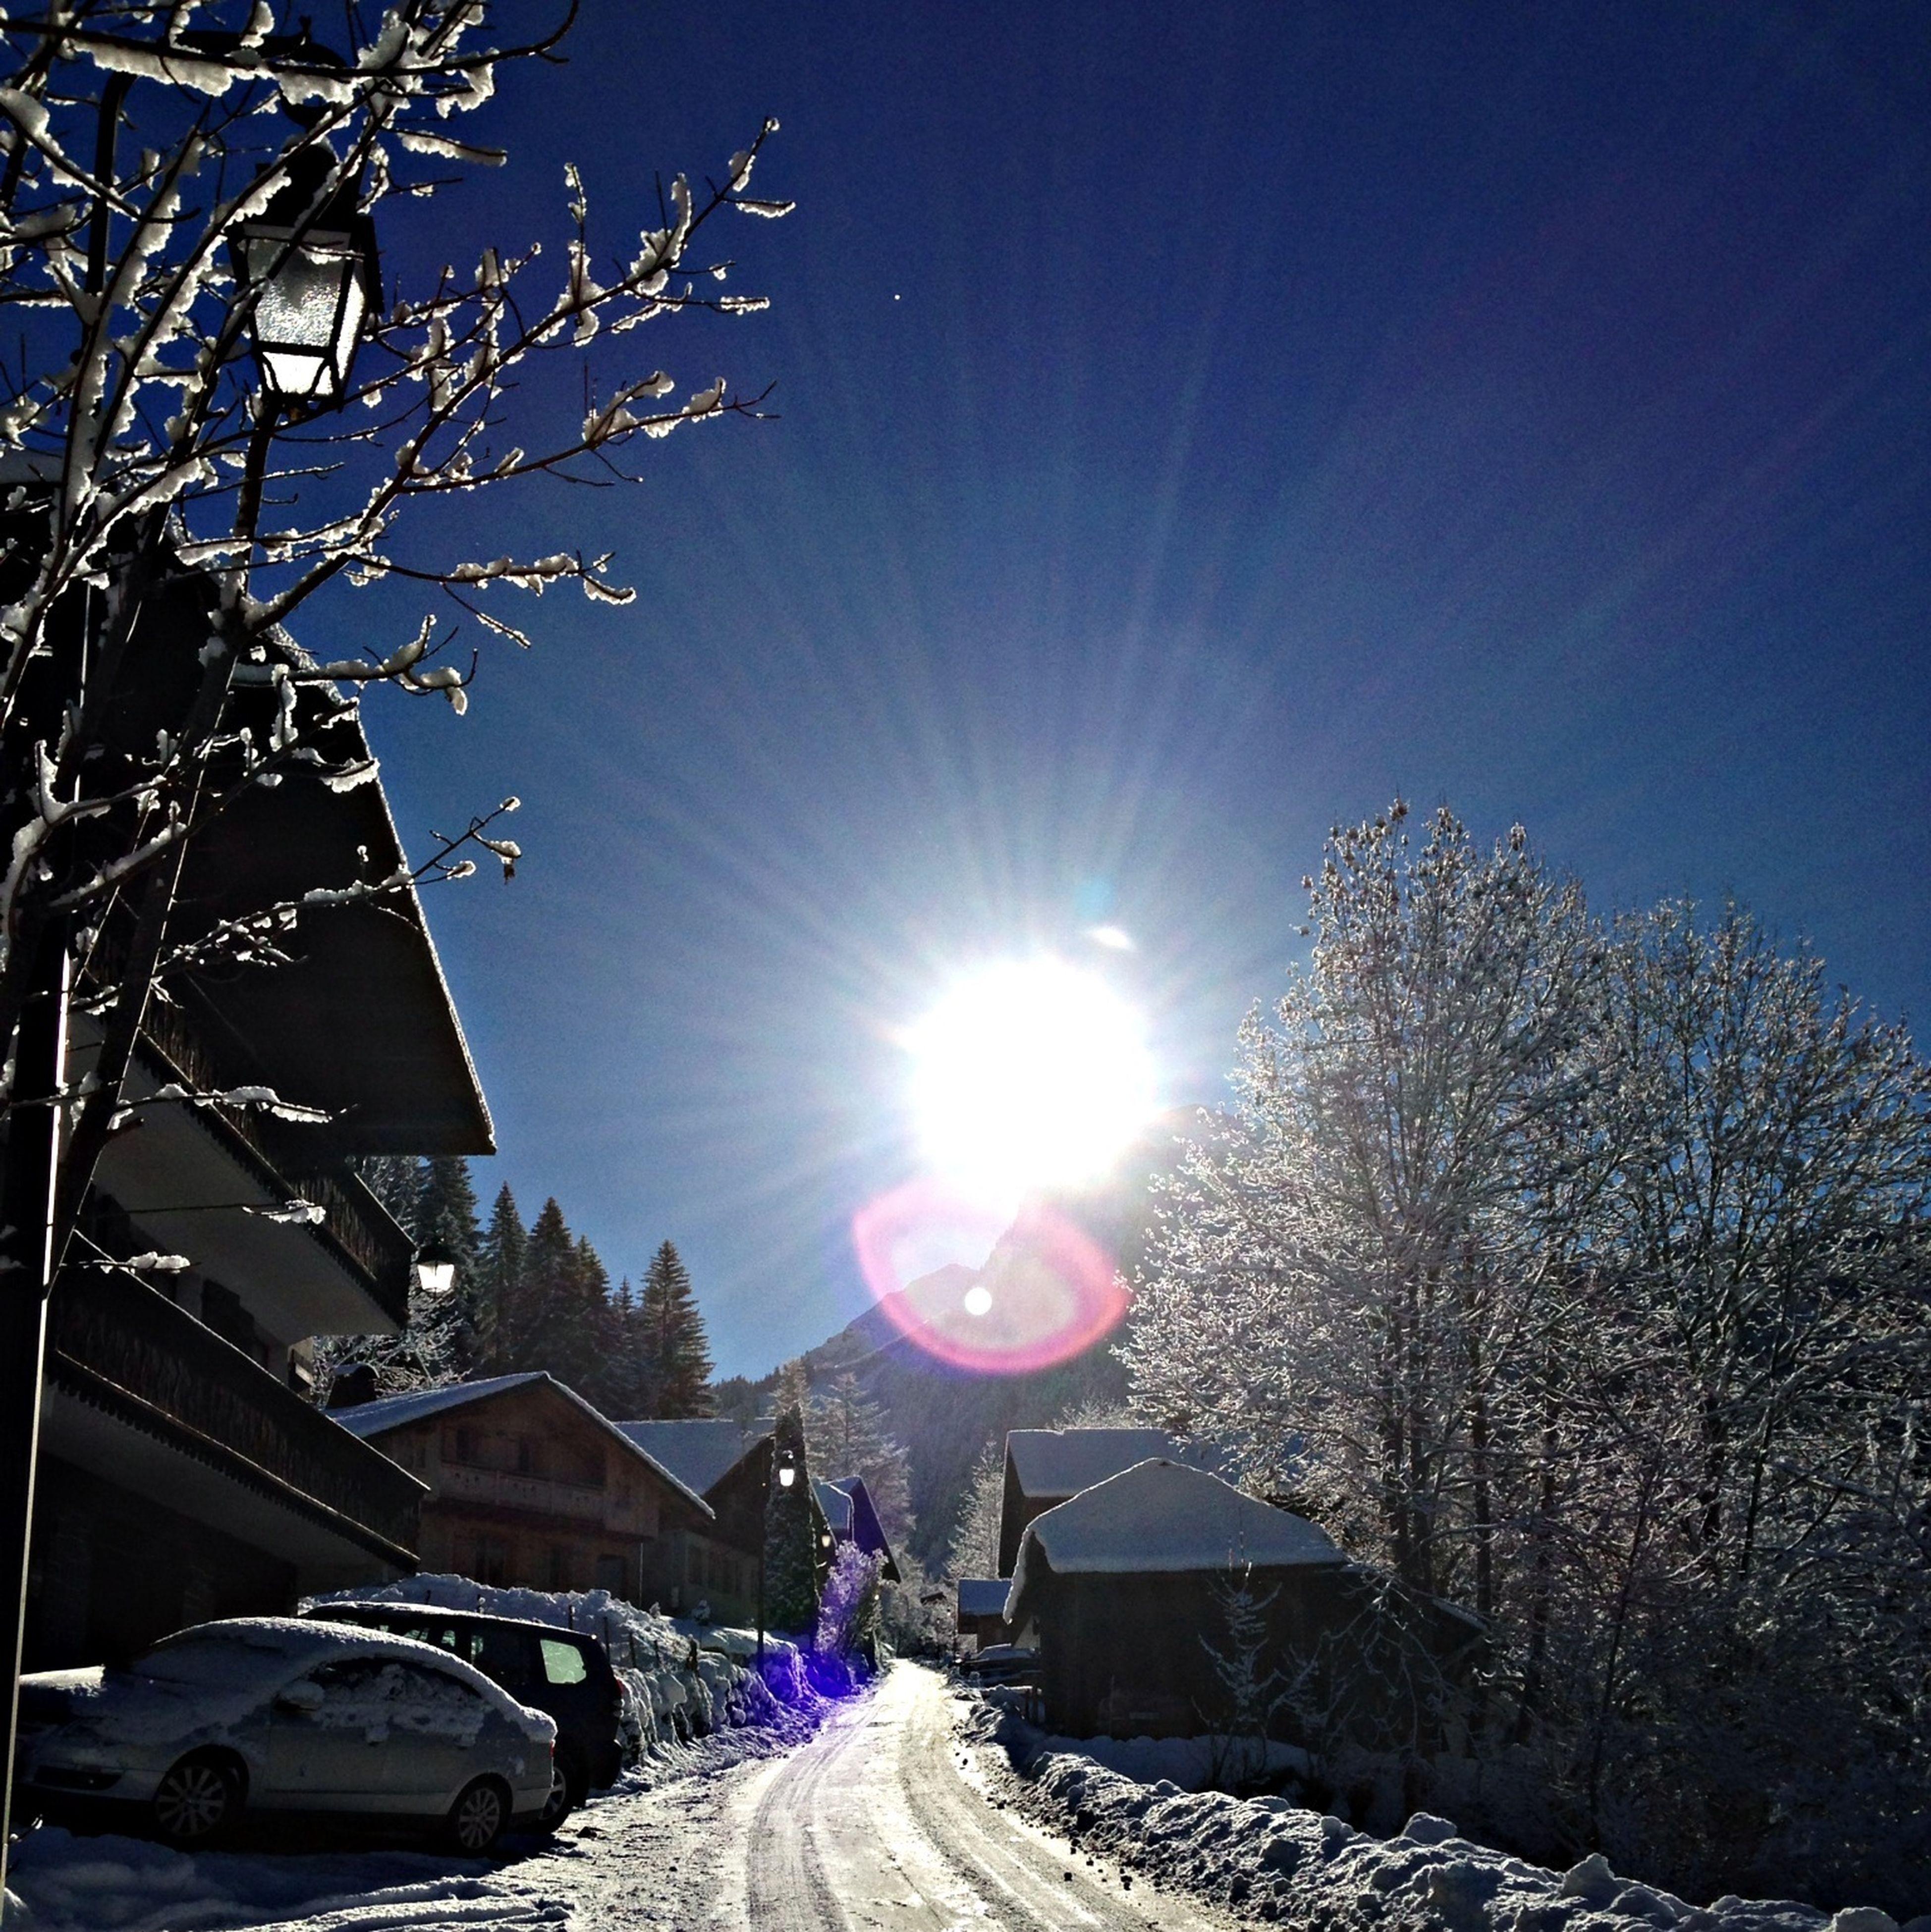 sun, lens flare, clear sky, land vehicle, sunbeam, transportation, car, sunlight, mode of transport, snow, winter, cold temperature, tree, bright, street, sunny, road, season, sky, bare tree